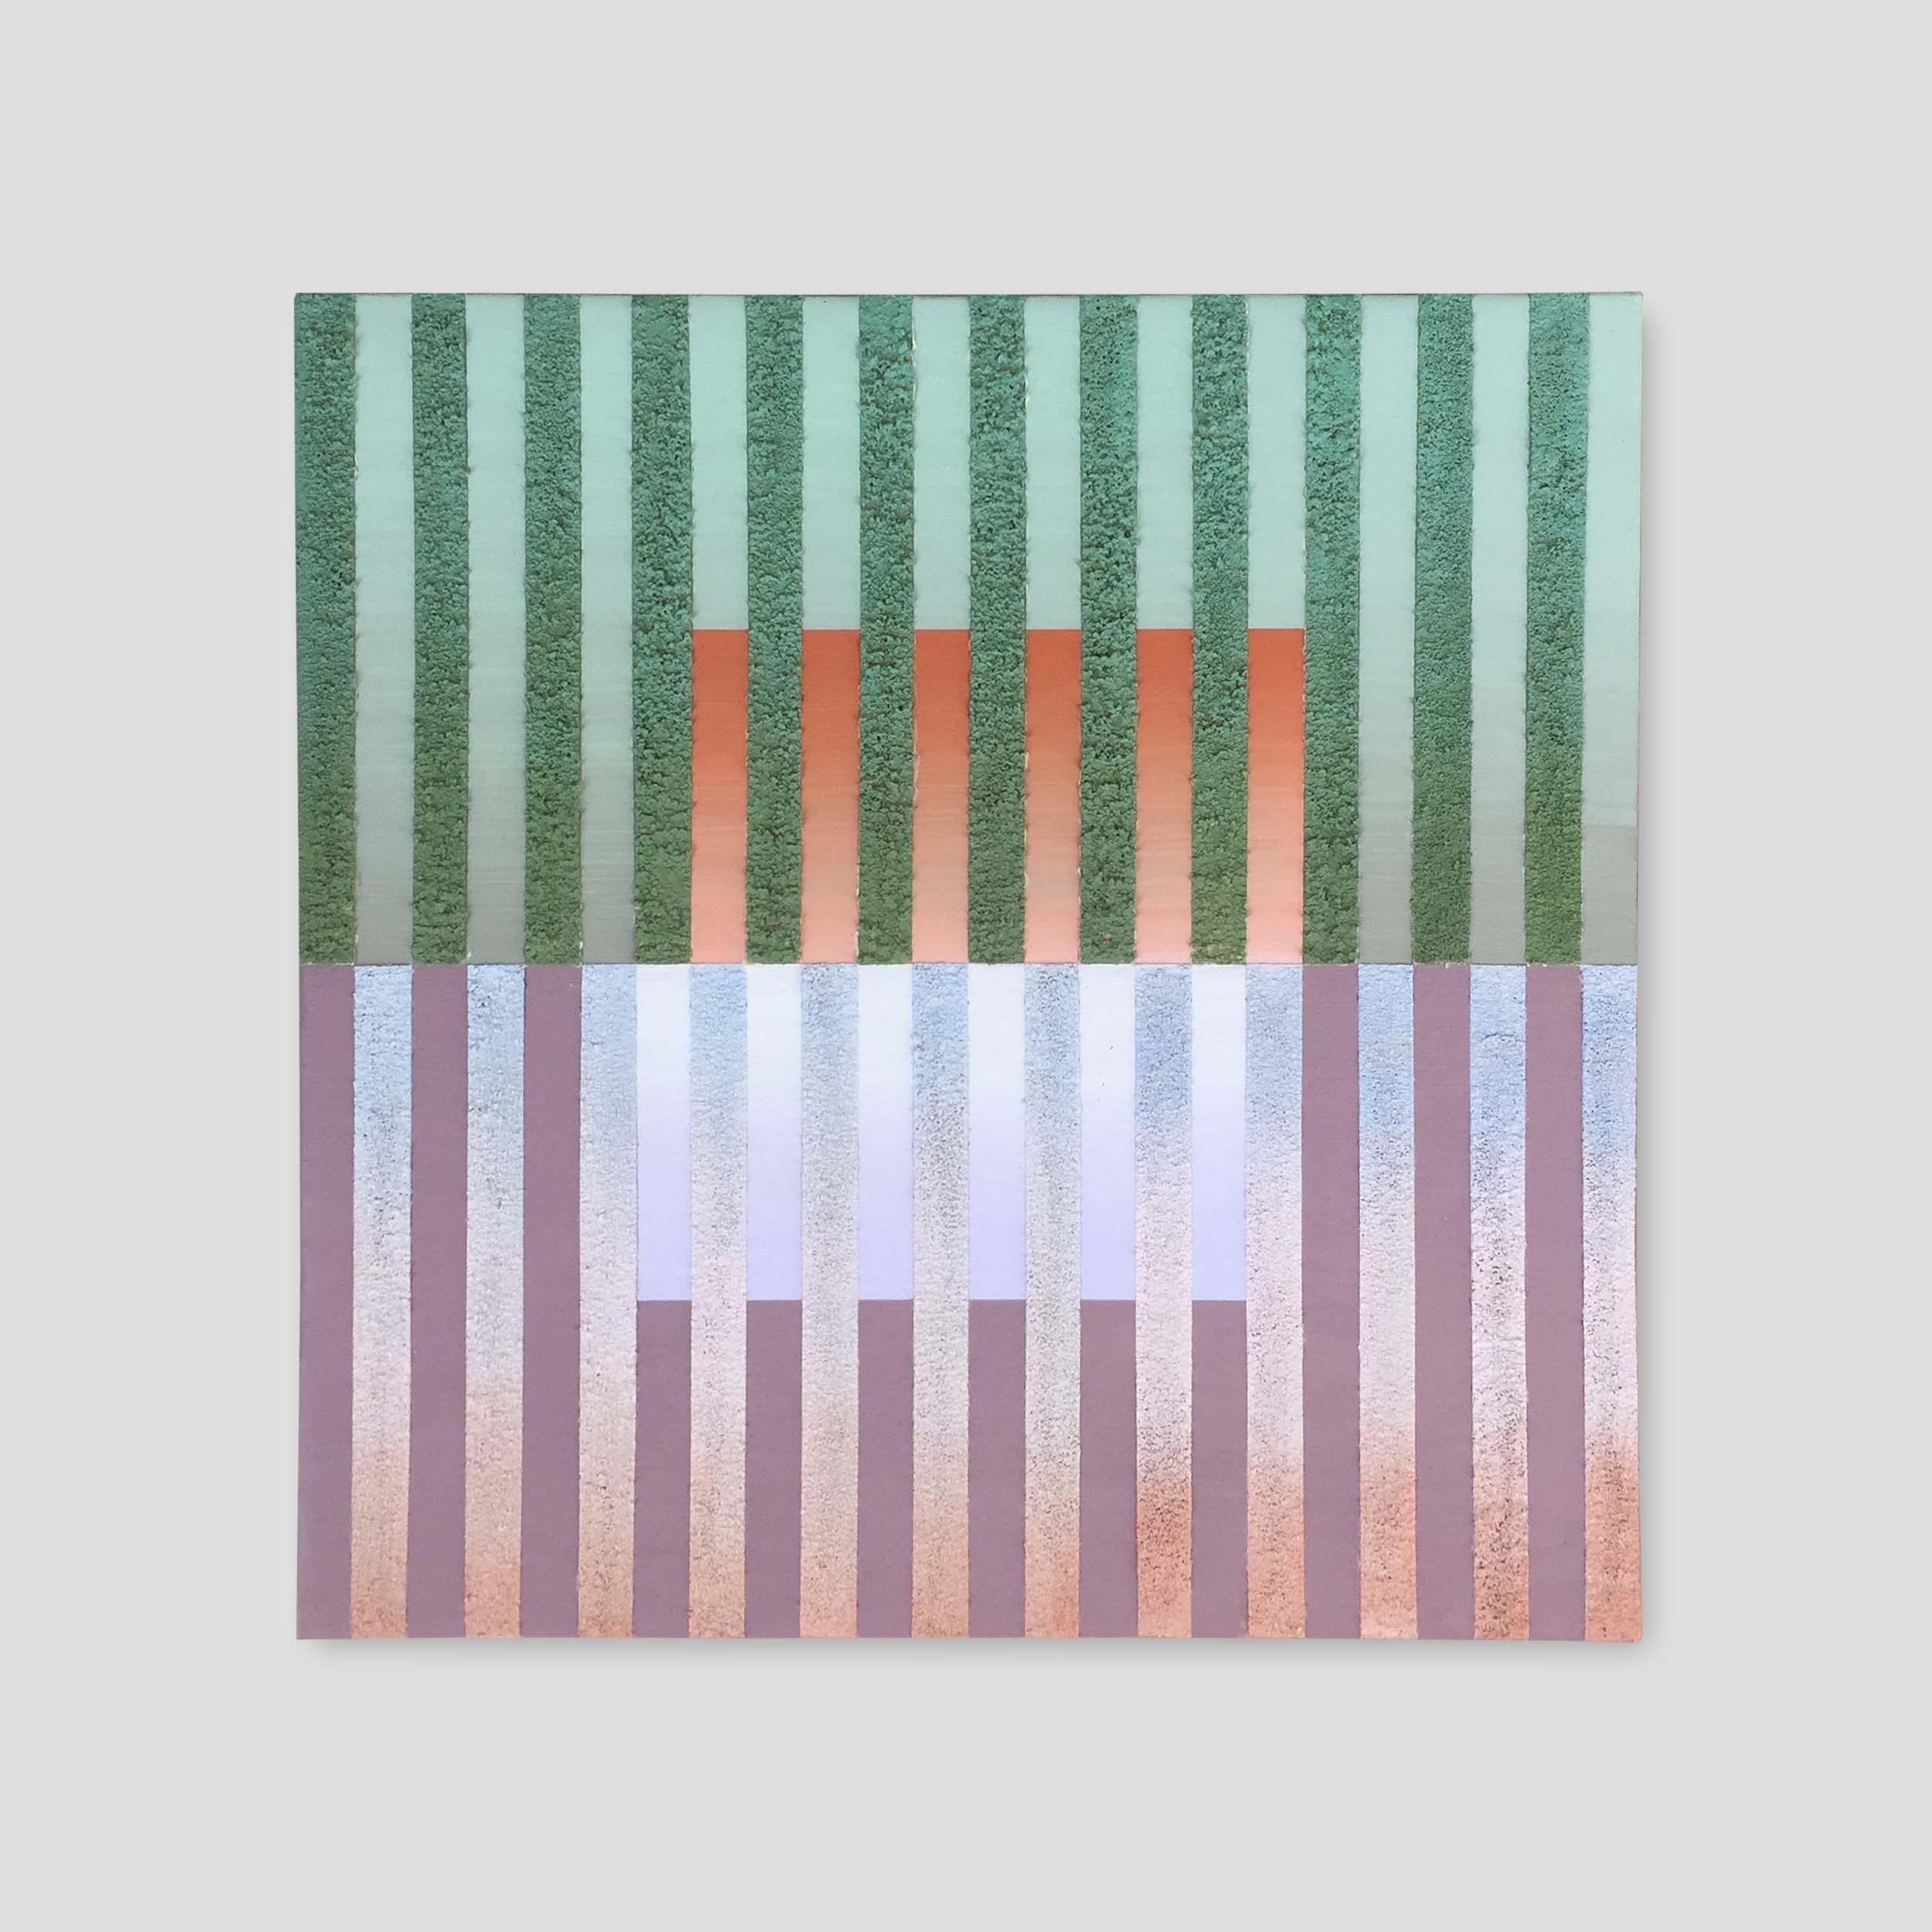 lenticular-composition-no.-2-b.jpg